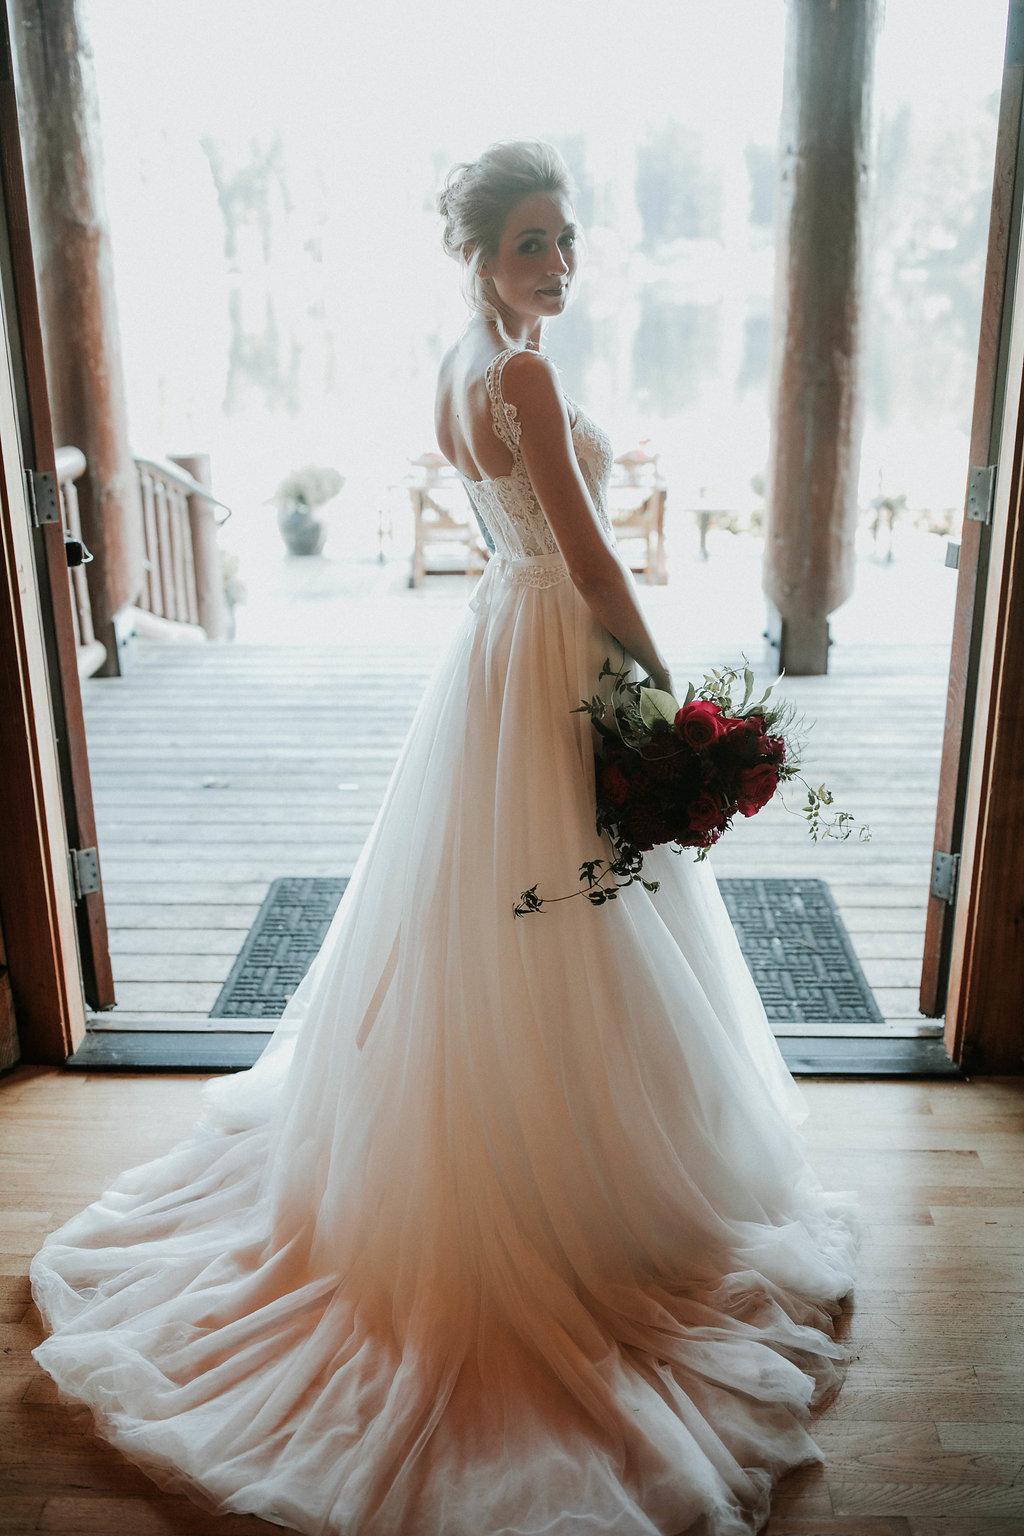 Crystal_Lake_lodge_Wedding_photos_by_Adina_Preston_Weddings_2ccccccccccccccccccc.JPG